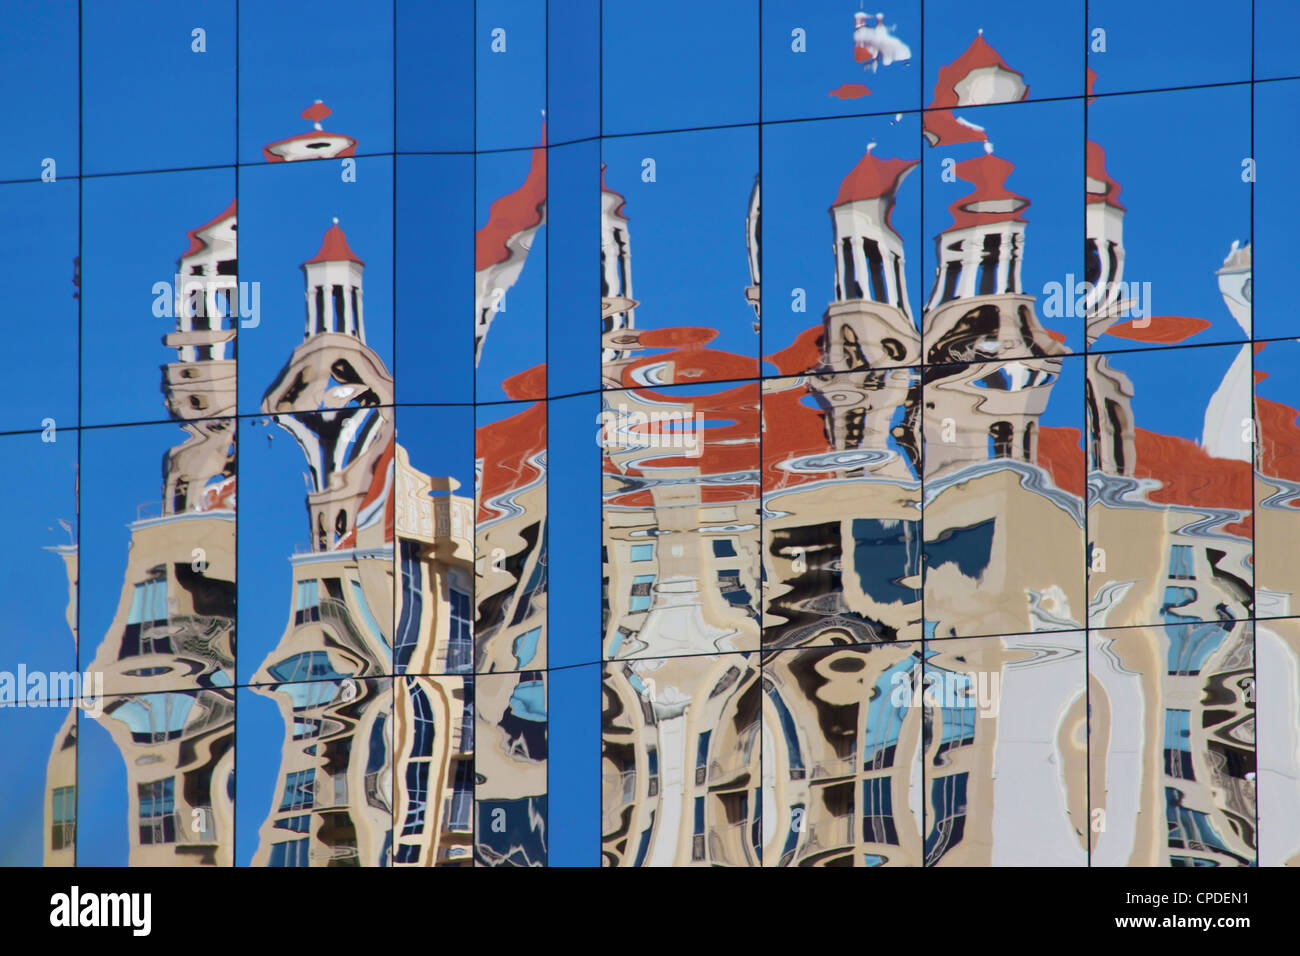 Reflection, Sarasota, Gulf Coast, Florida, United States of America, North America - Stock Image